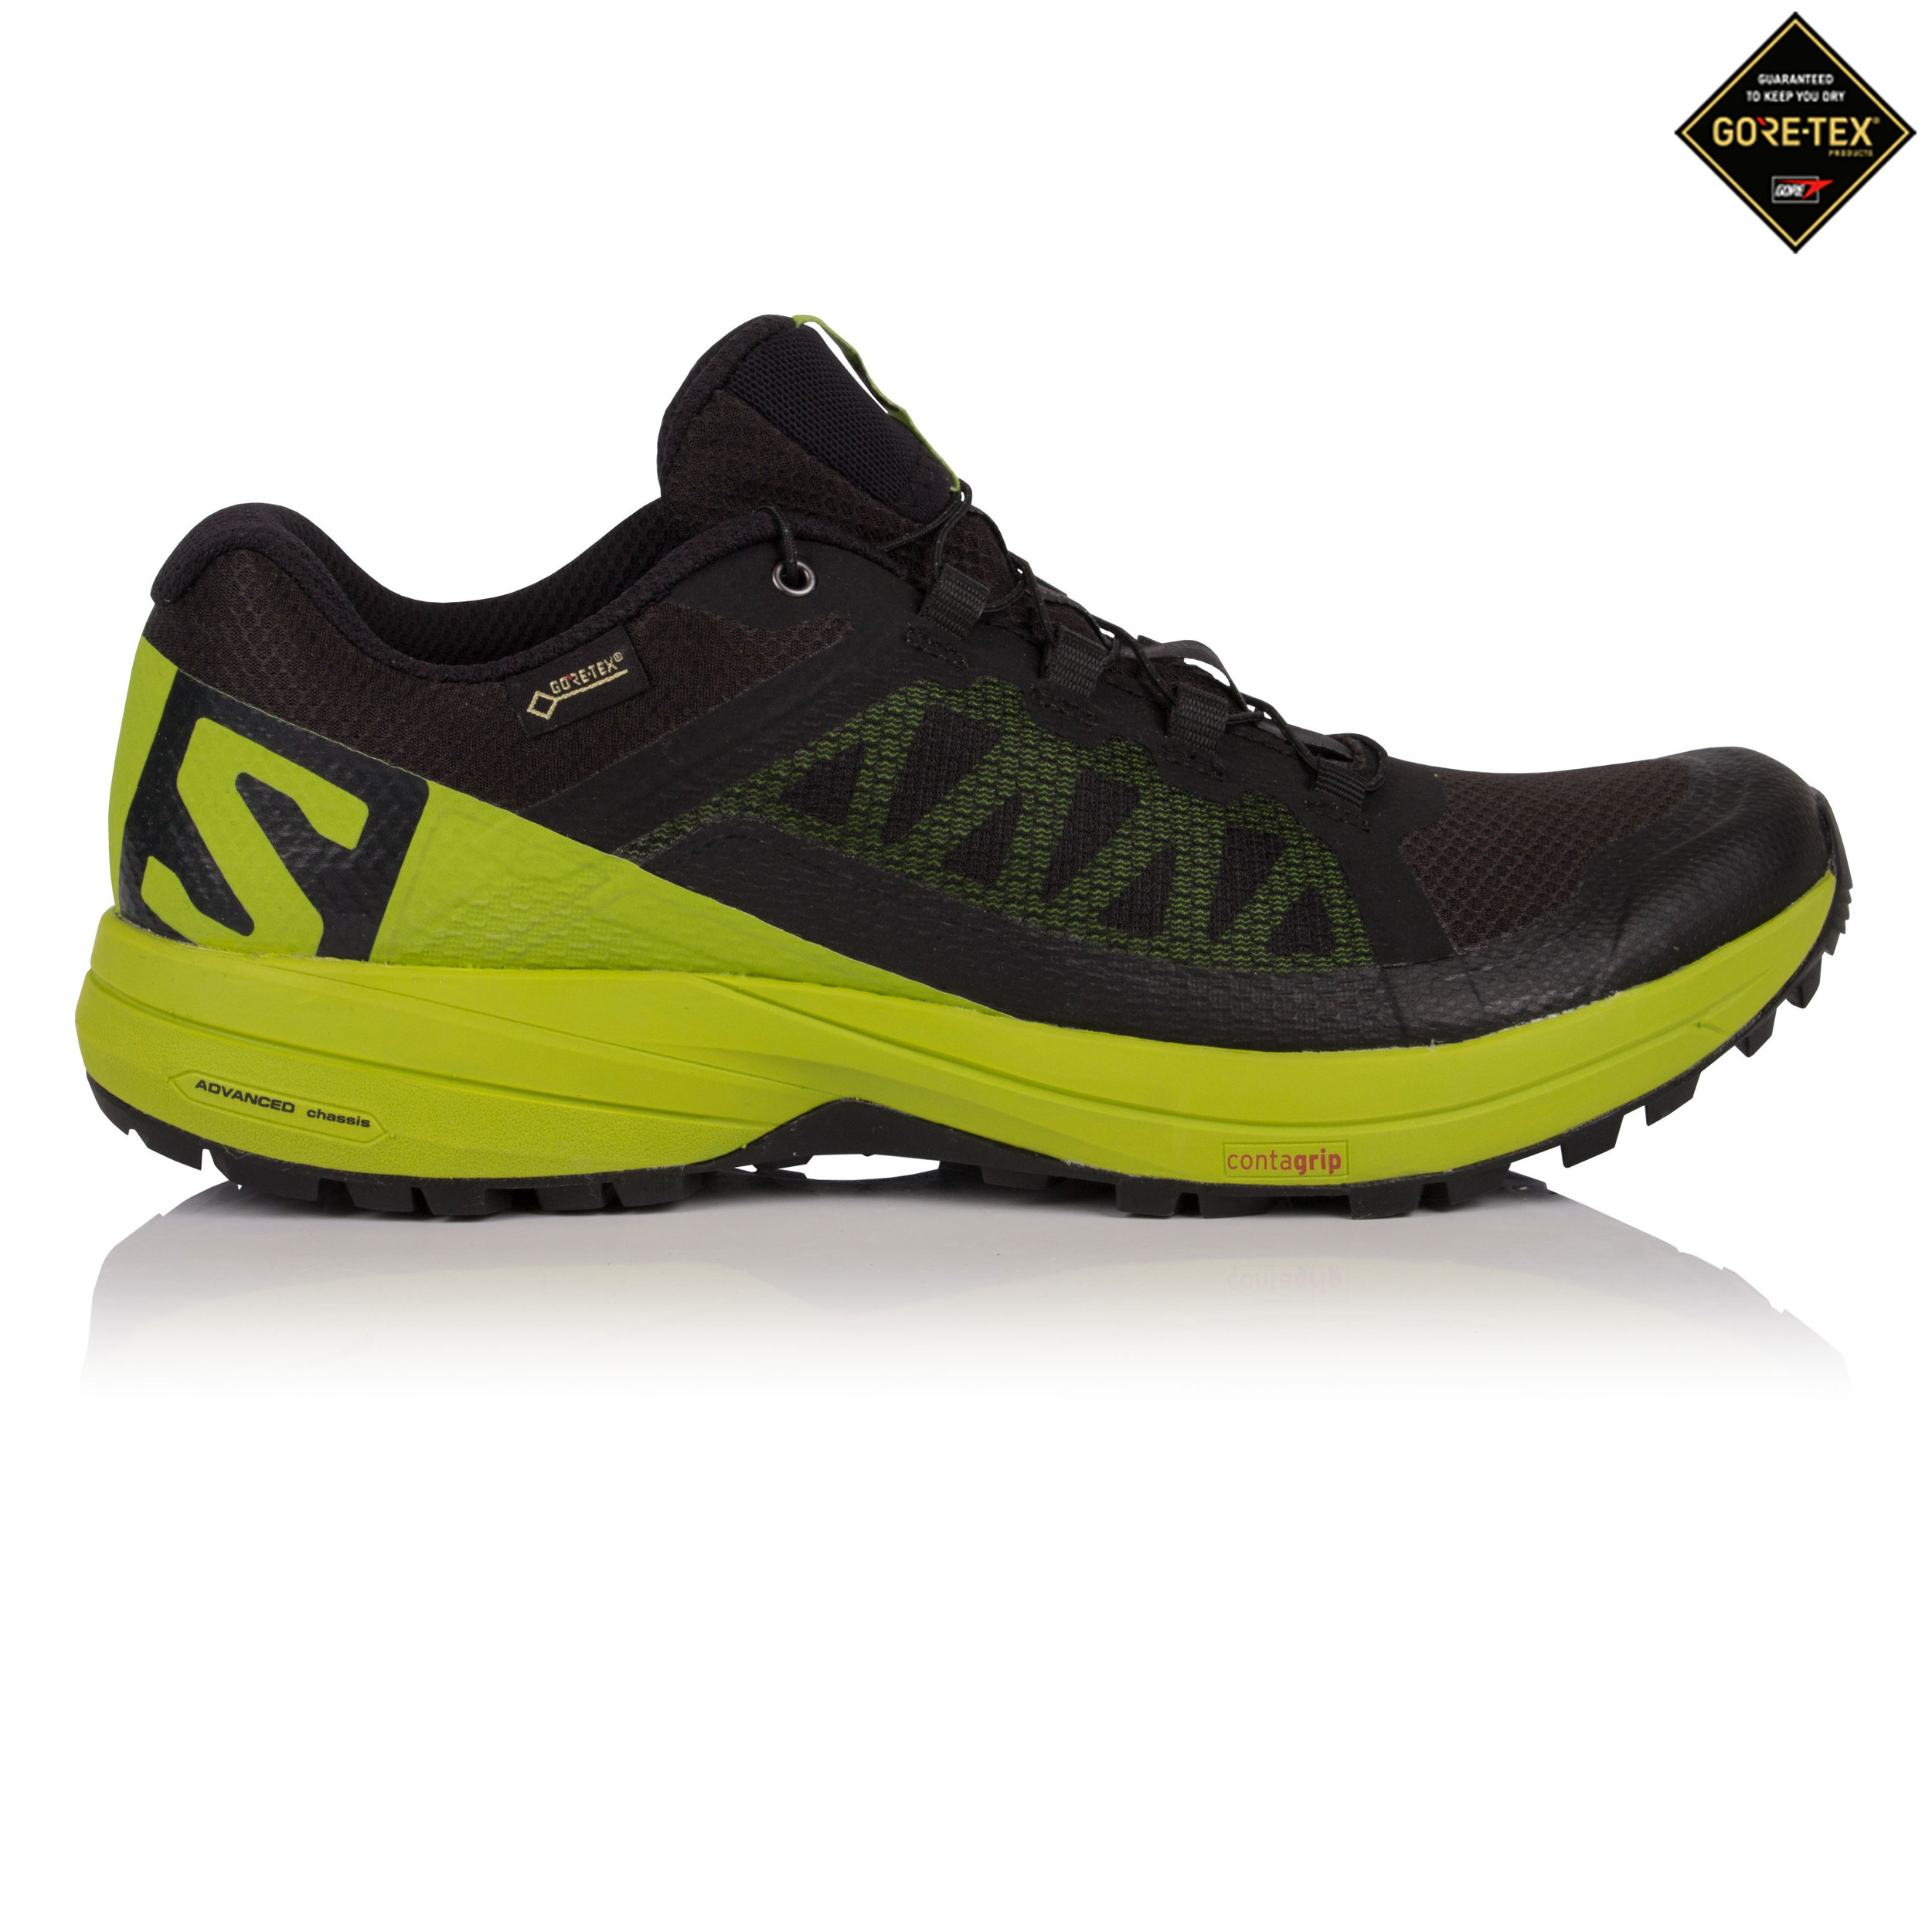 scarpe da trekking salomon contagrip